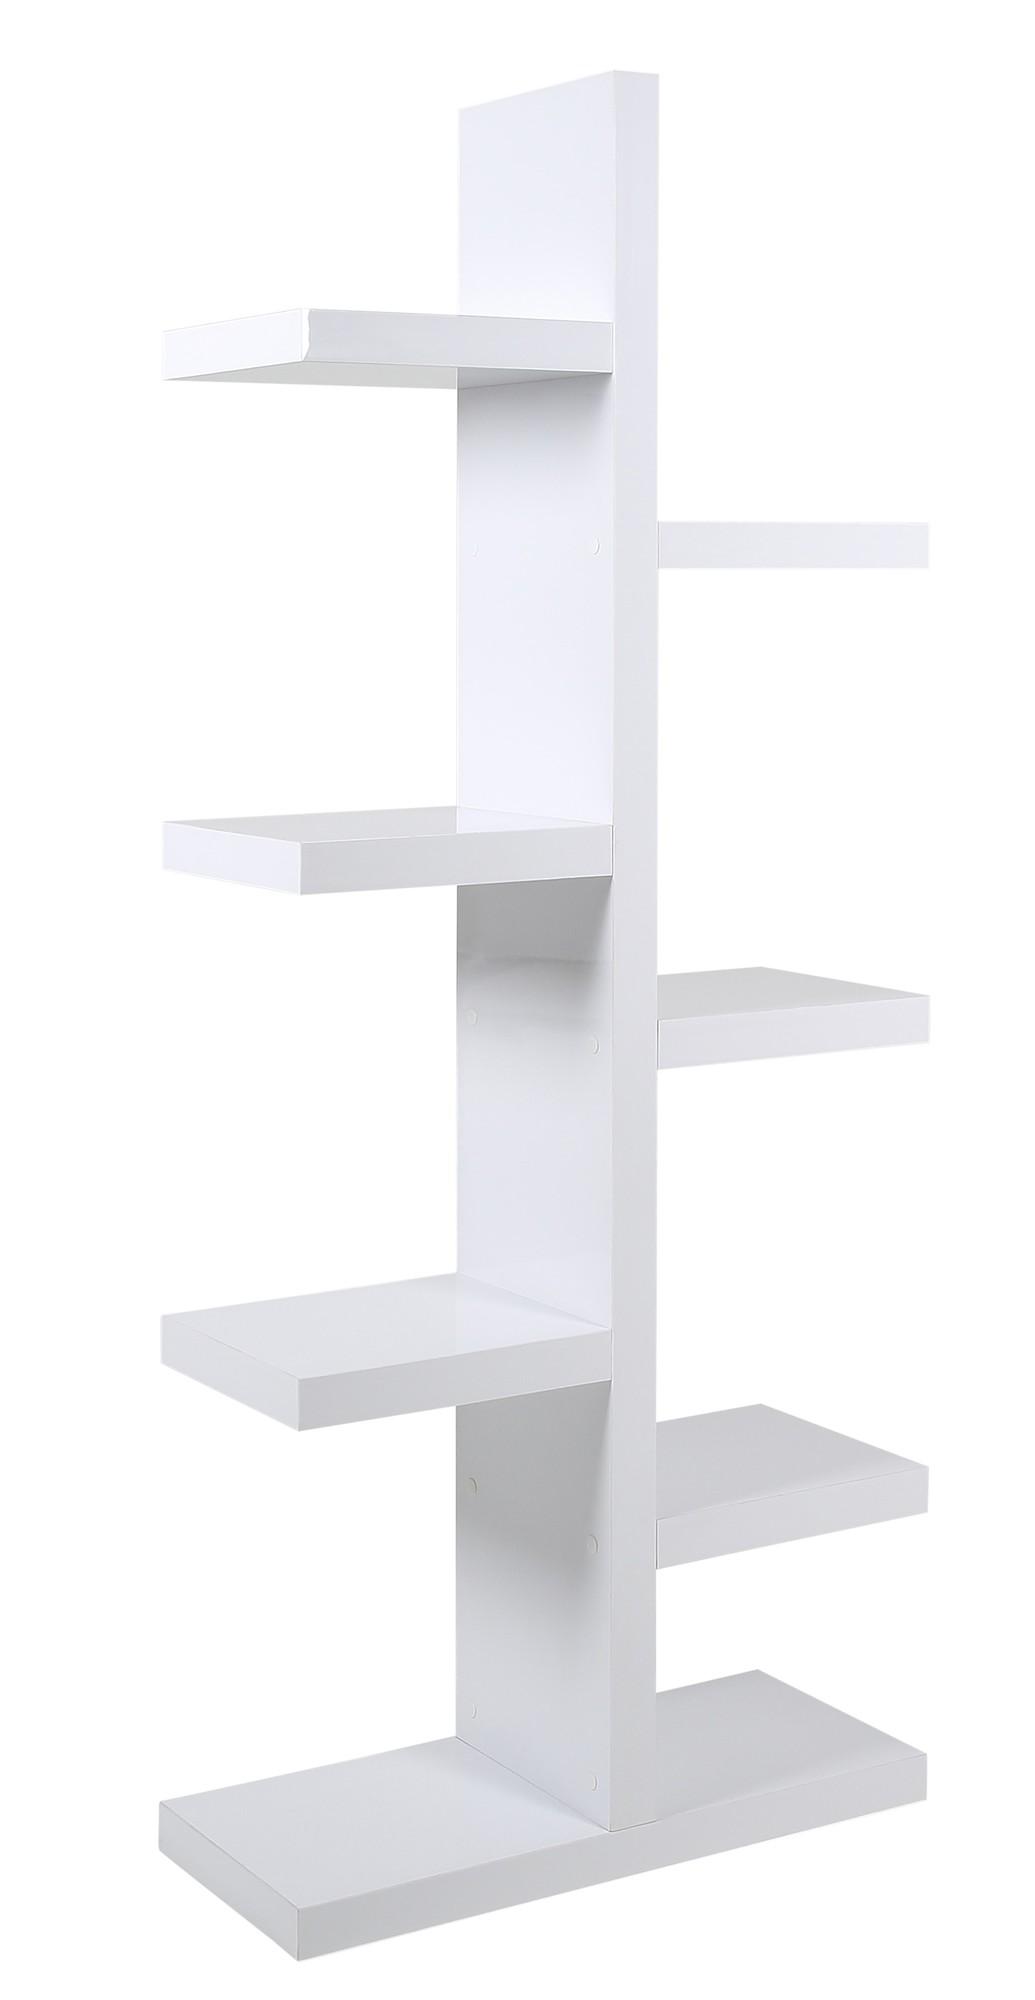 https://www.designonline24.nl/media/catalog/product/2/4/24designs-boekenkast-stairway-wit-1.jpg